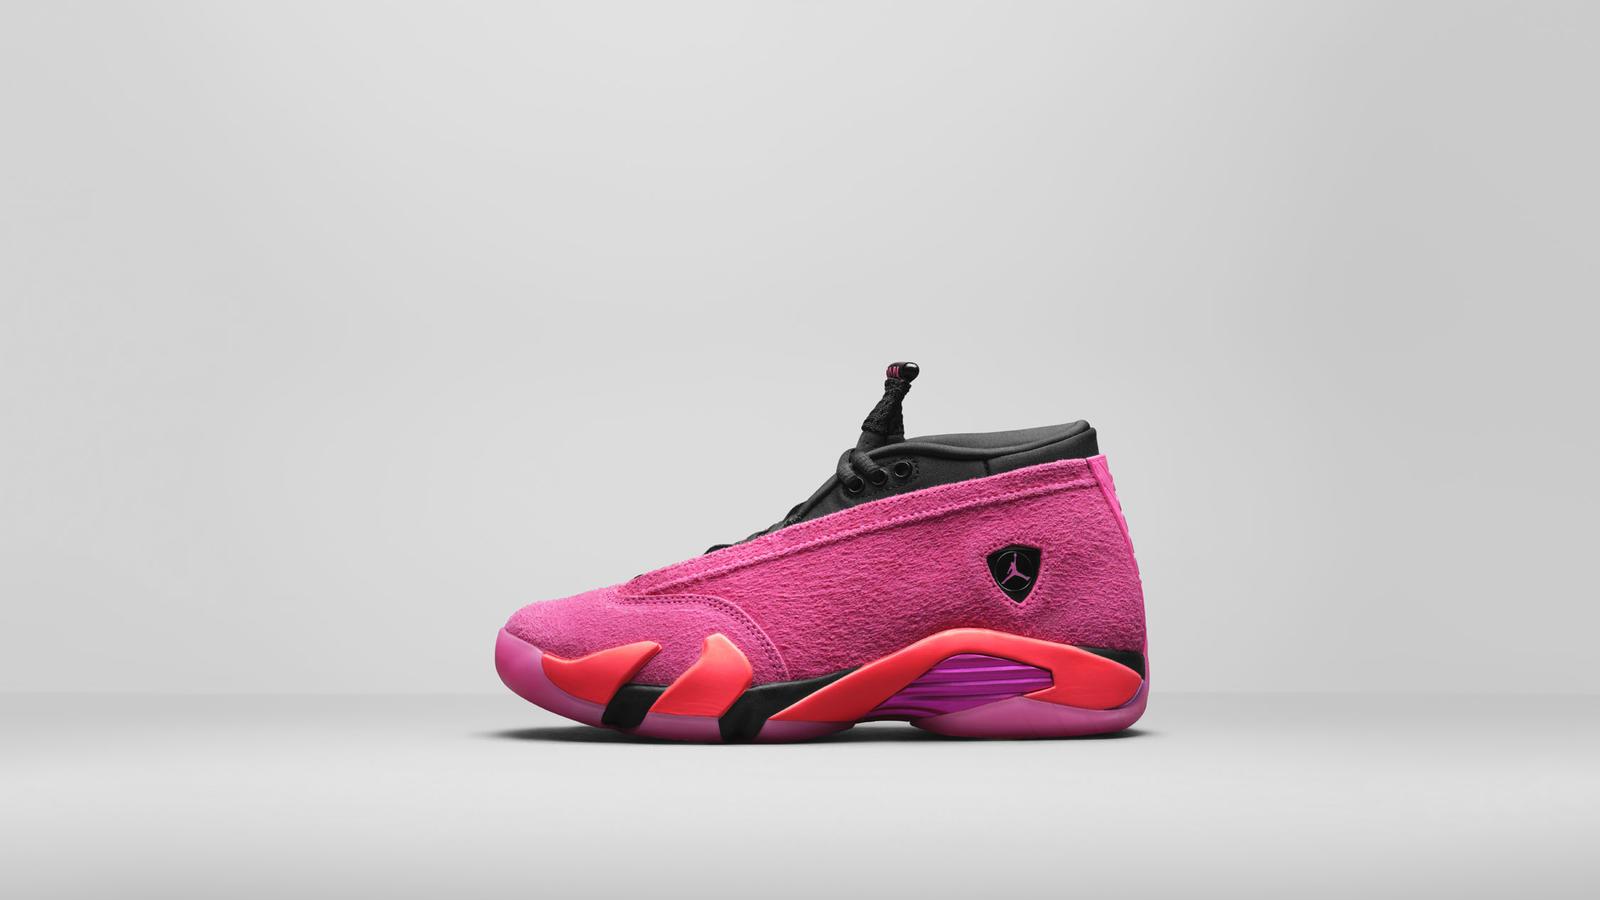 Nike News Jordan Brand Ho21 Retro Preview Aj Xiv Retro Low Dh4121 600 A1 Lateral V02 Lr